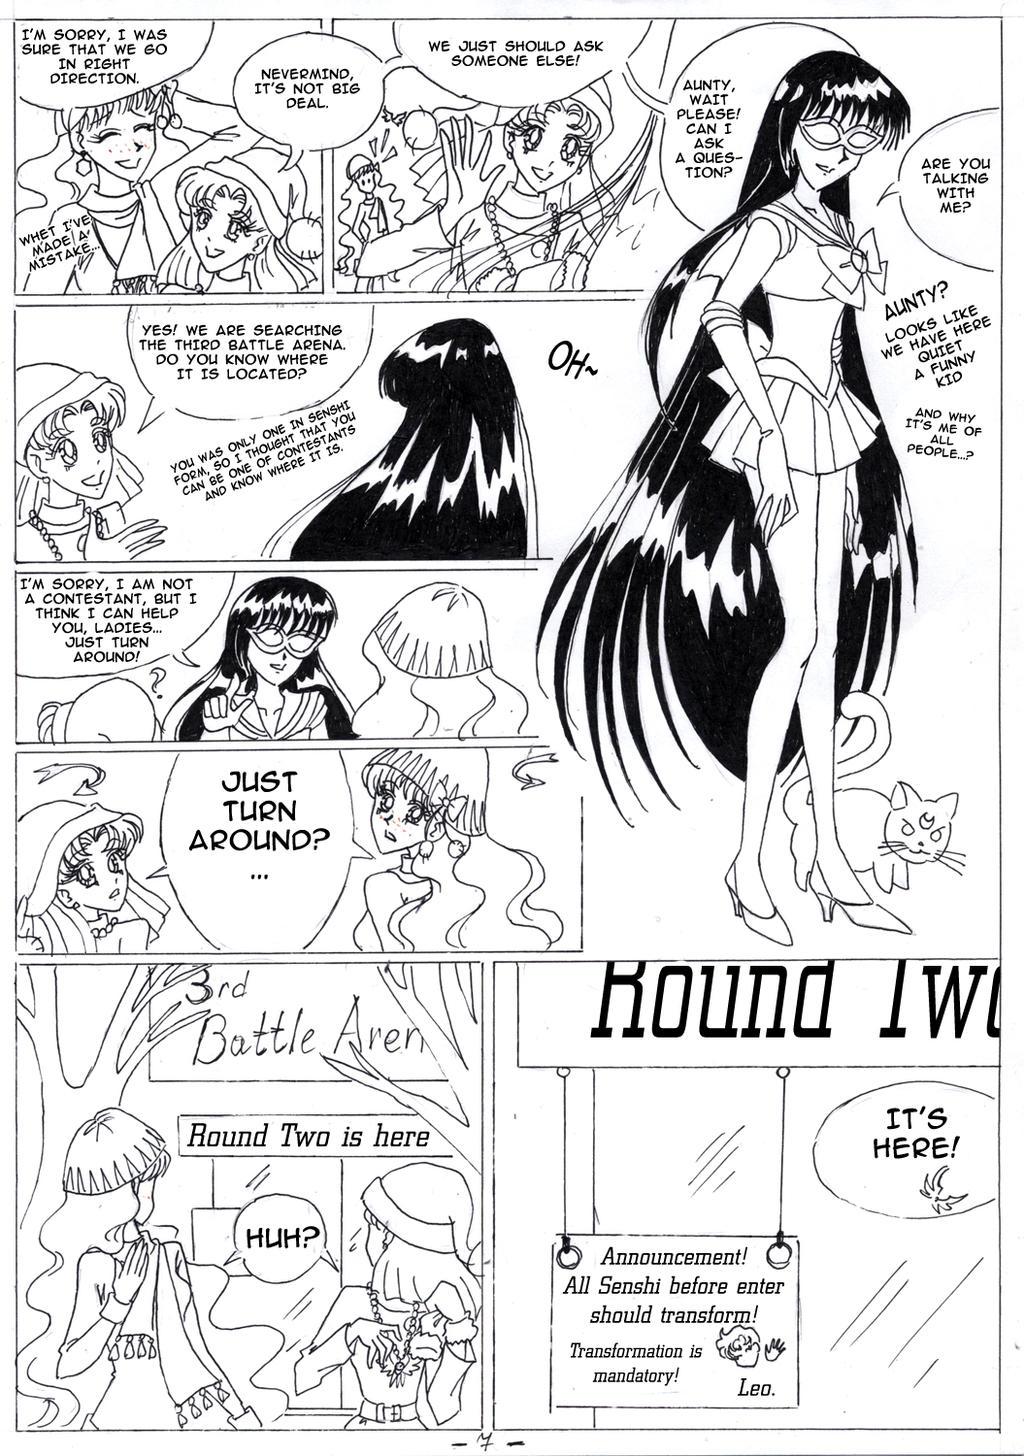 nephrite wallpaper containing comic - photo #26